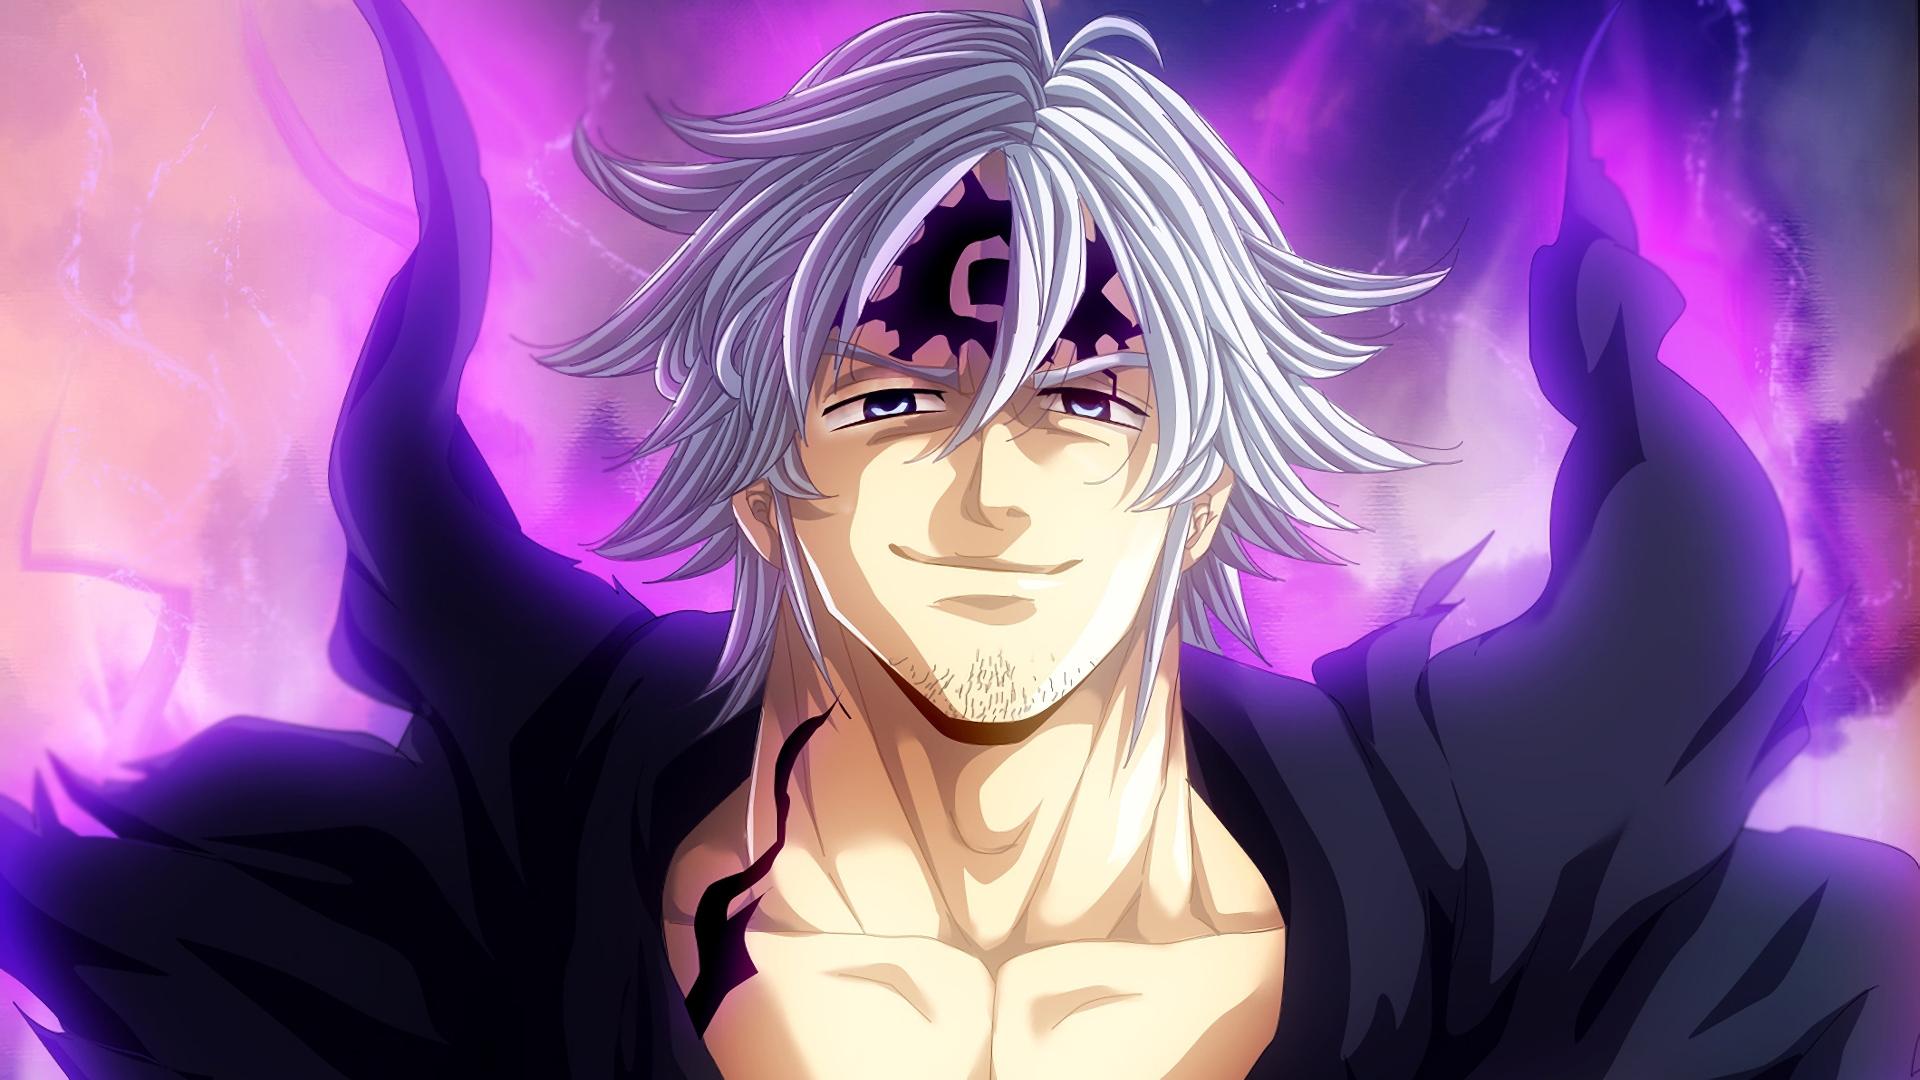 Download 1920x1080 Wallpaper Anime Boy The Seven Deadly Sins